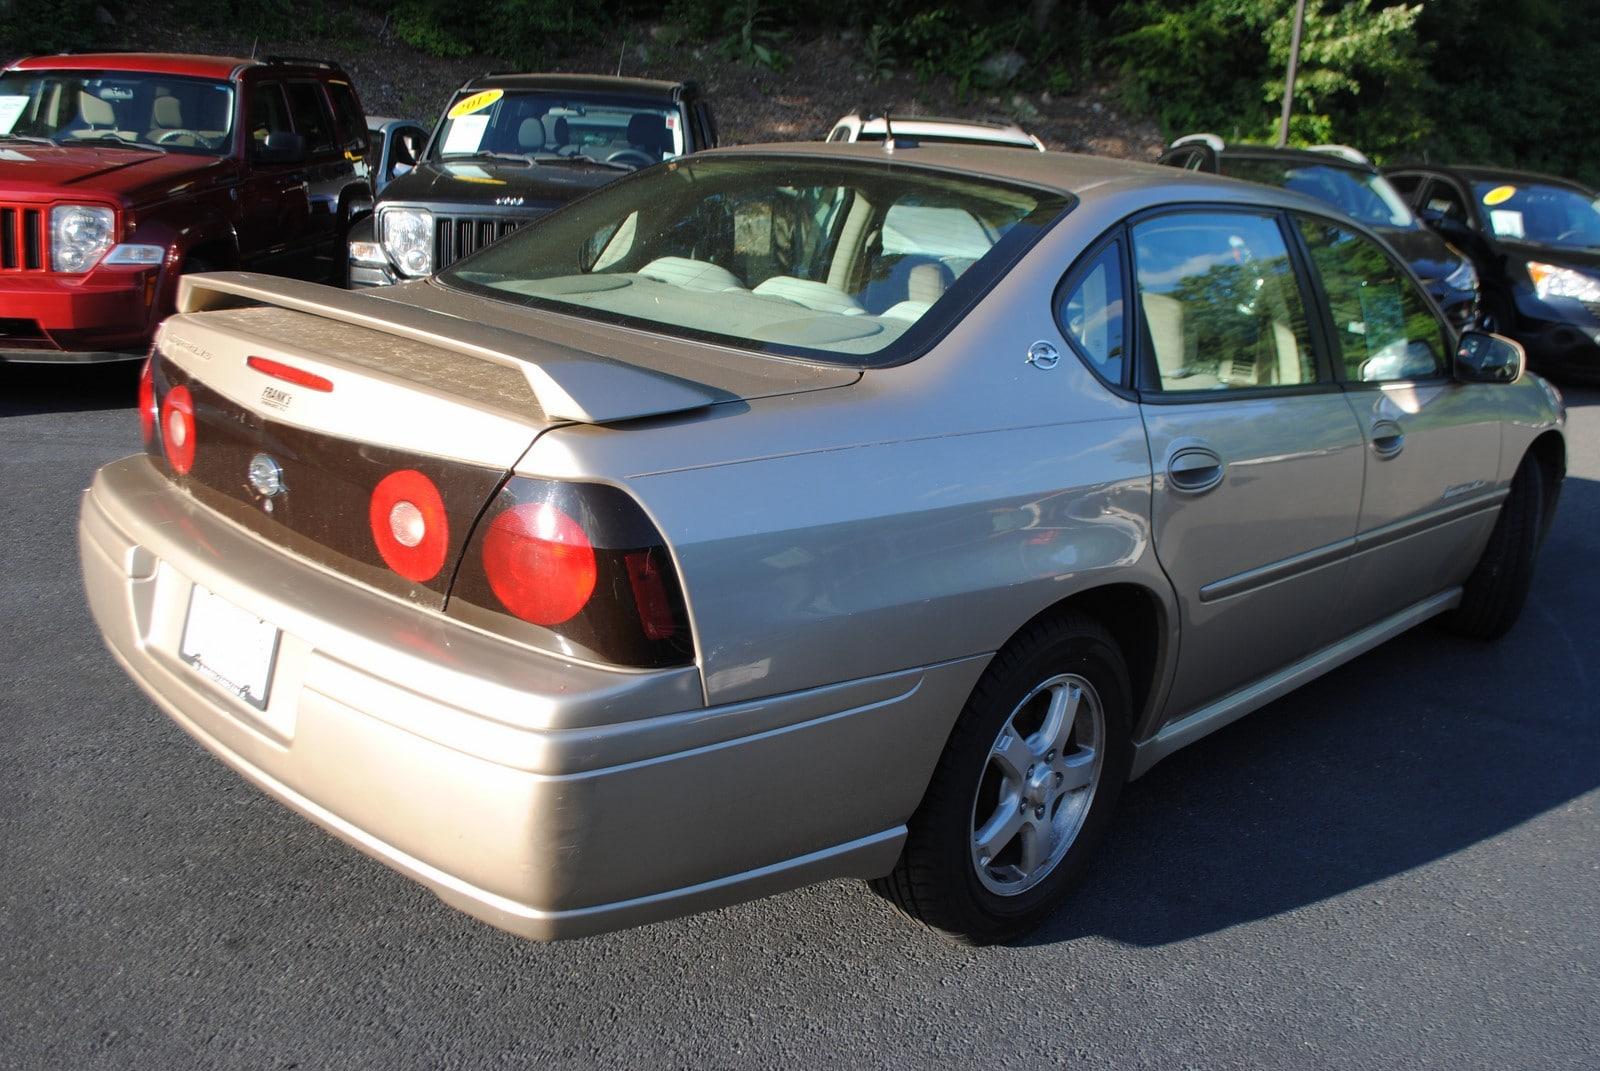 ... 2005 Chevrolet Impala LS 3.8 Sedan ...